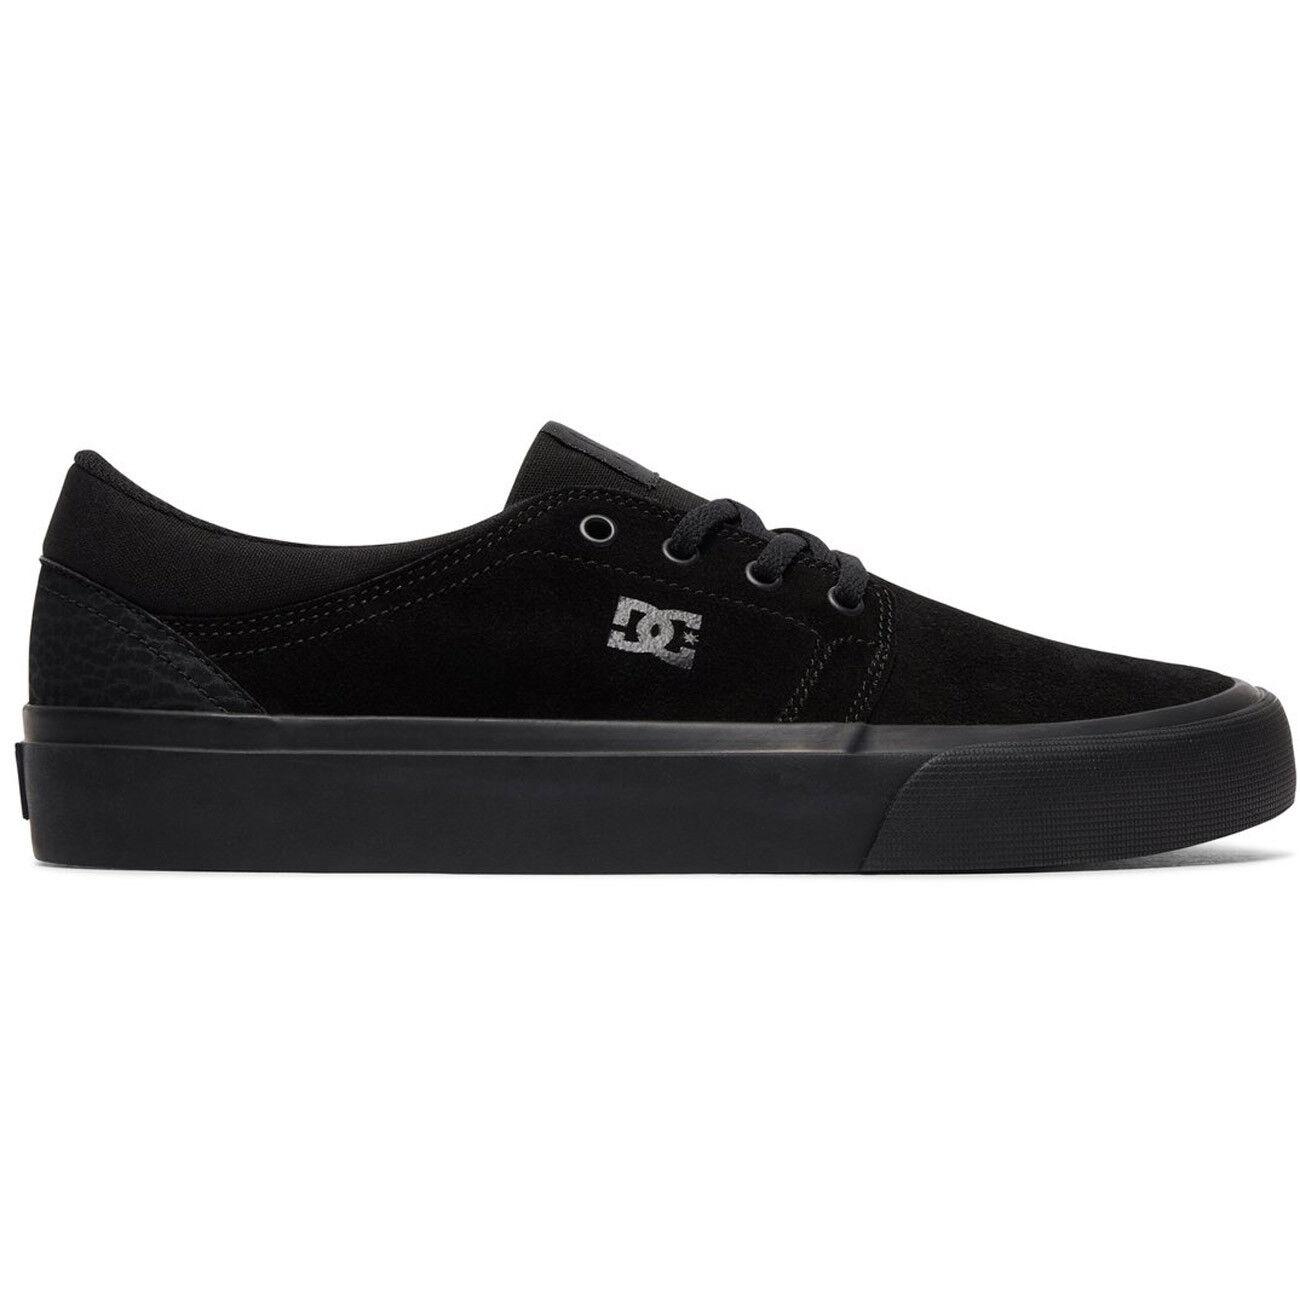 DC Herren TRASE Sneaker TRASE Herren SD M Zapatos ed661e